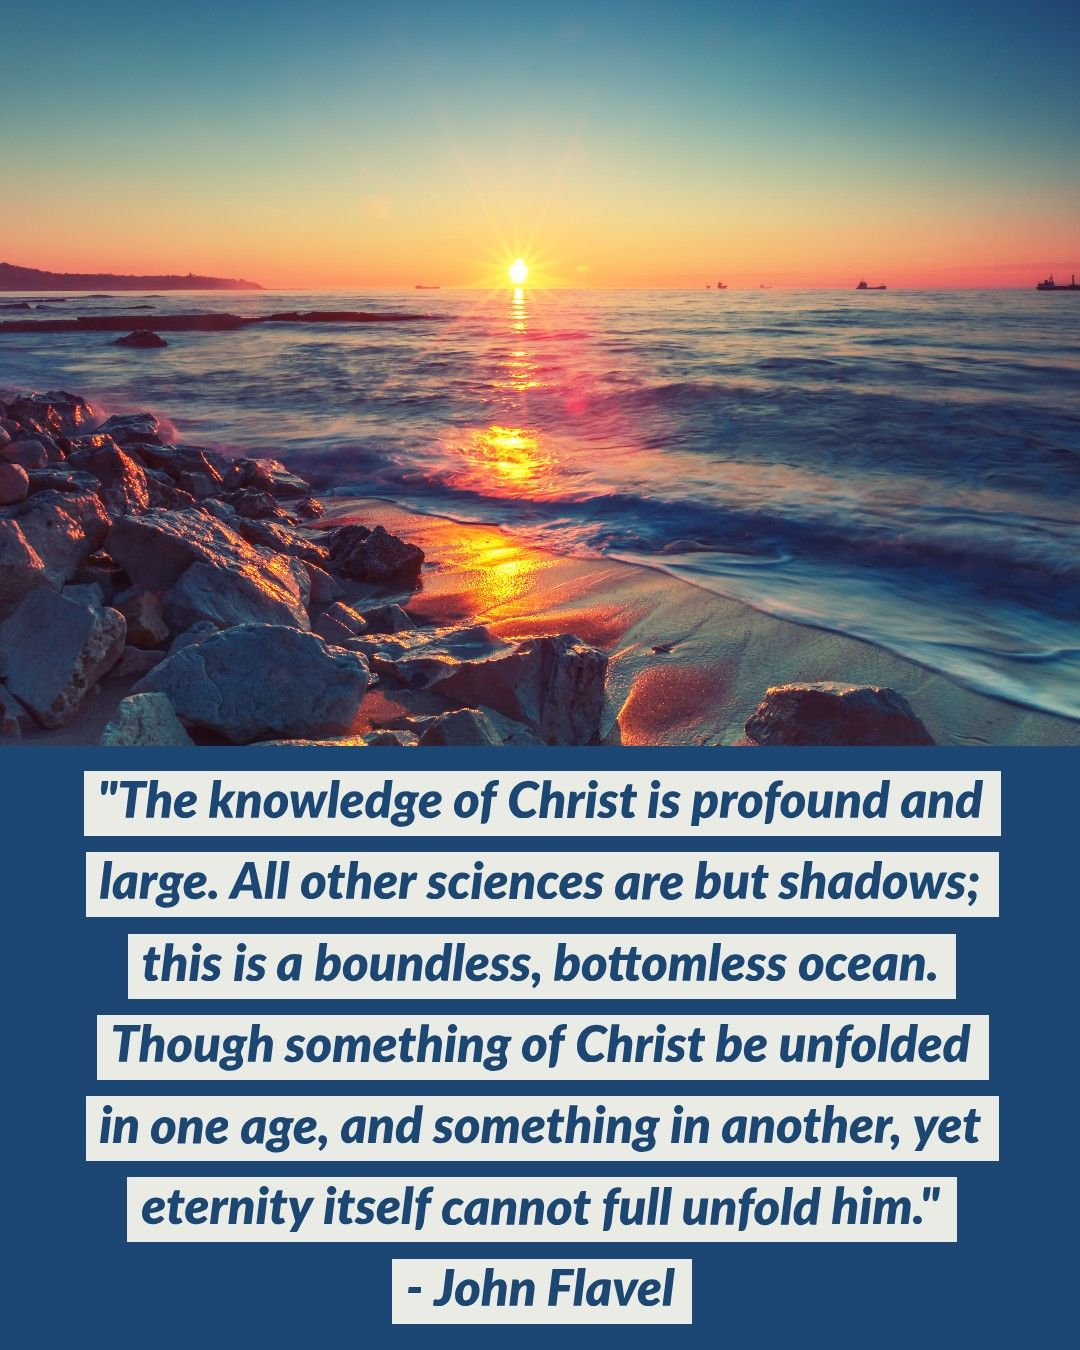 Flavel-Christ-Profound-Knowledge-Eternity